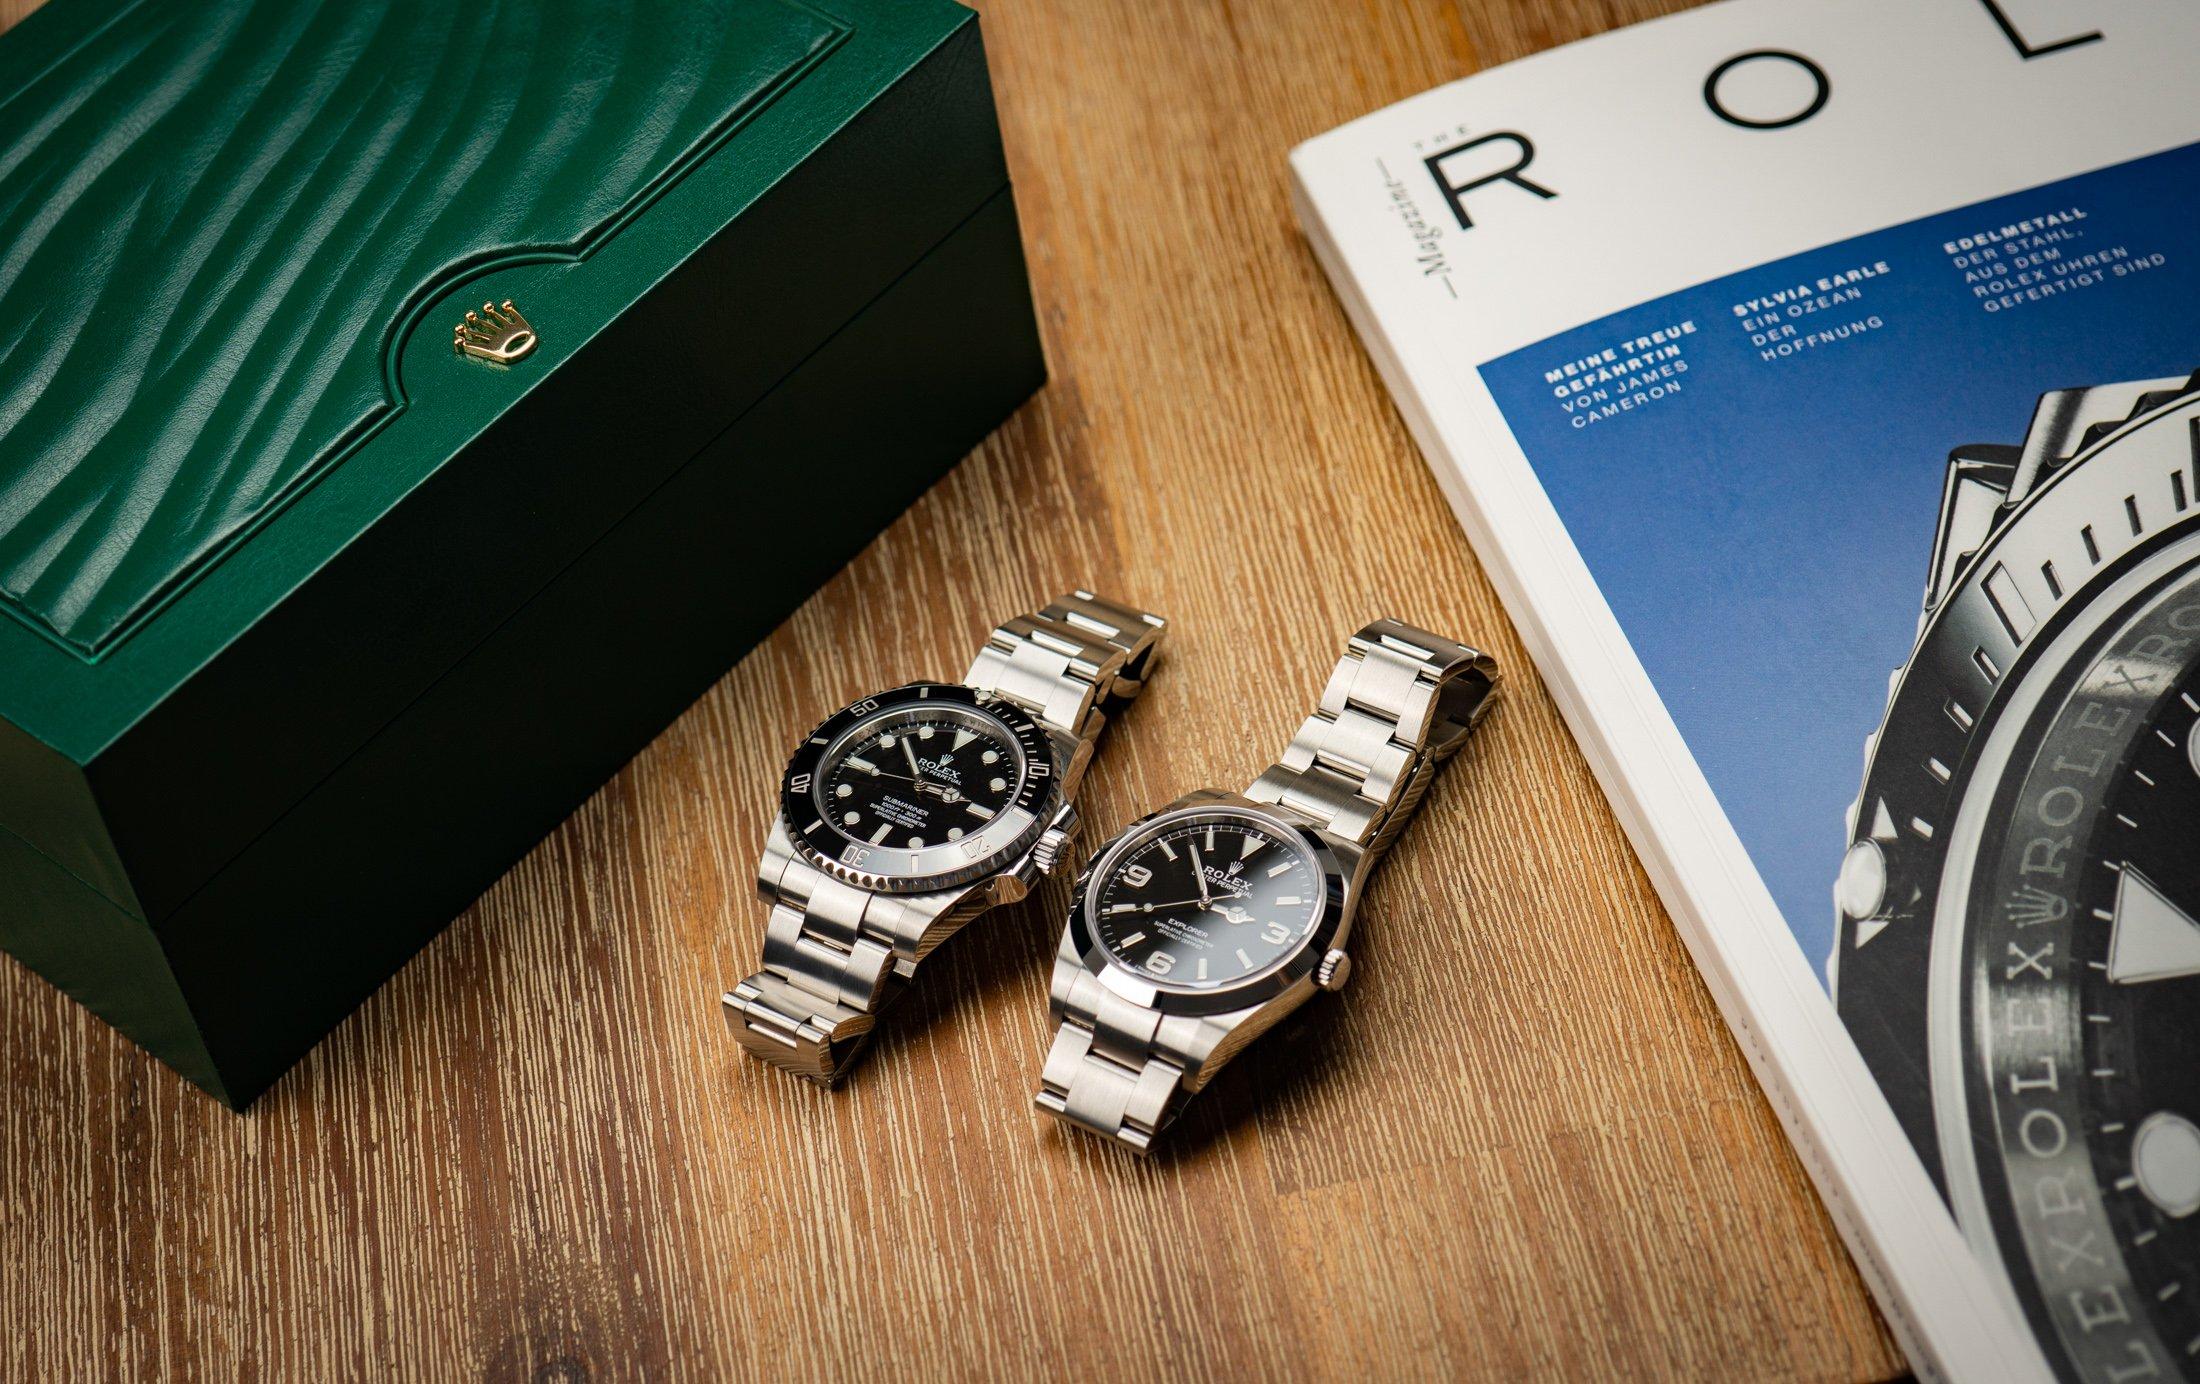 Rolex-Explorer-I-vs.-Submariner-Test